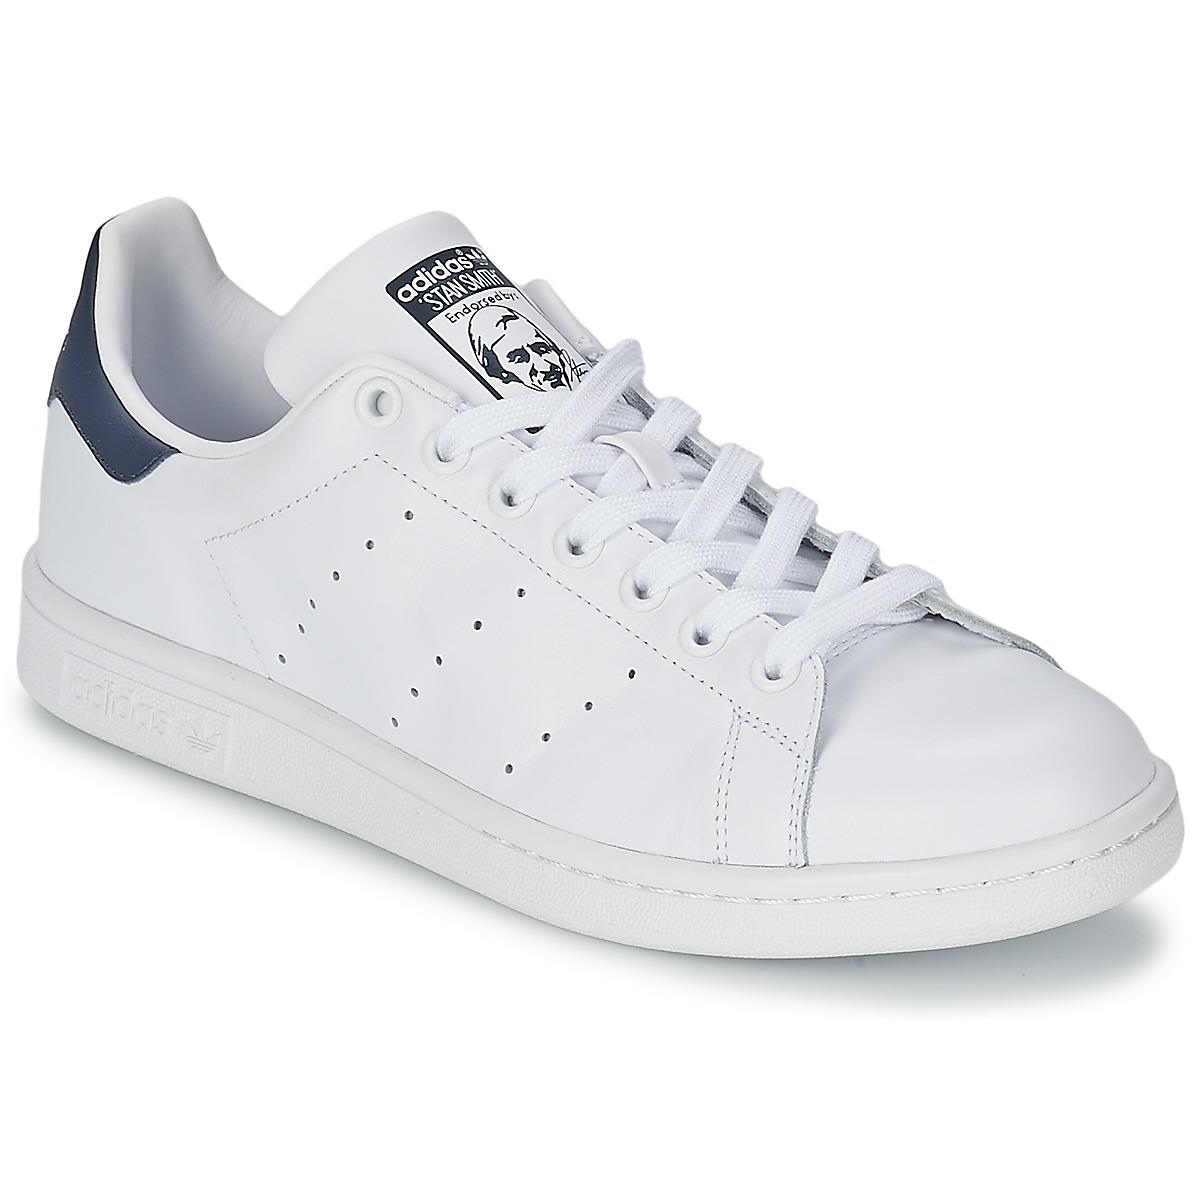 edbe4d4c01e Xαμηλά Sneakers adidas STAN SMITH, Ανδρικά sneakers, ΑΝΔΡΑΣ ...